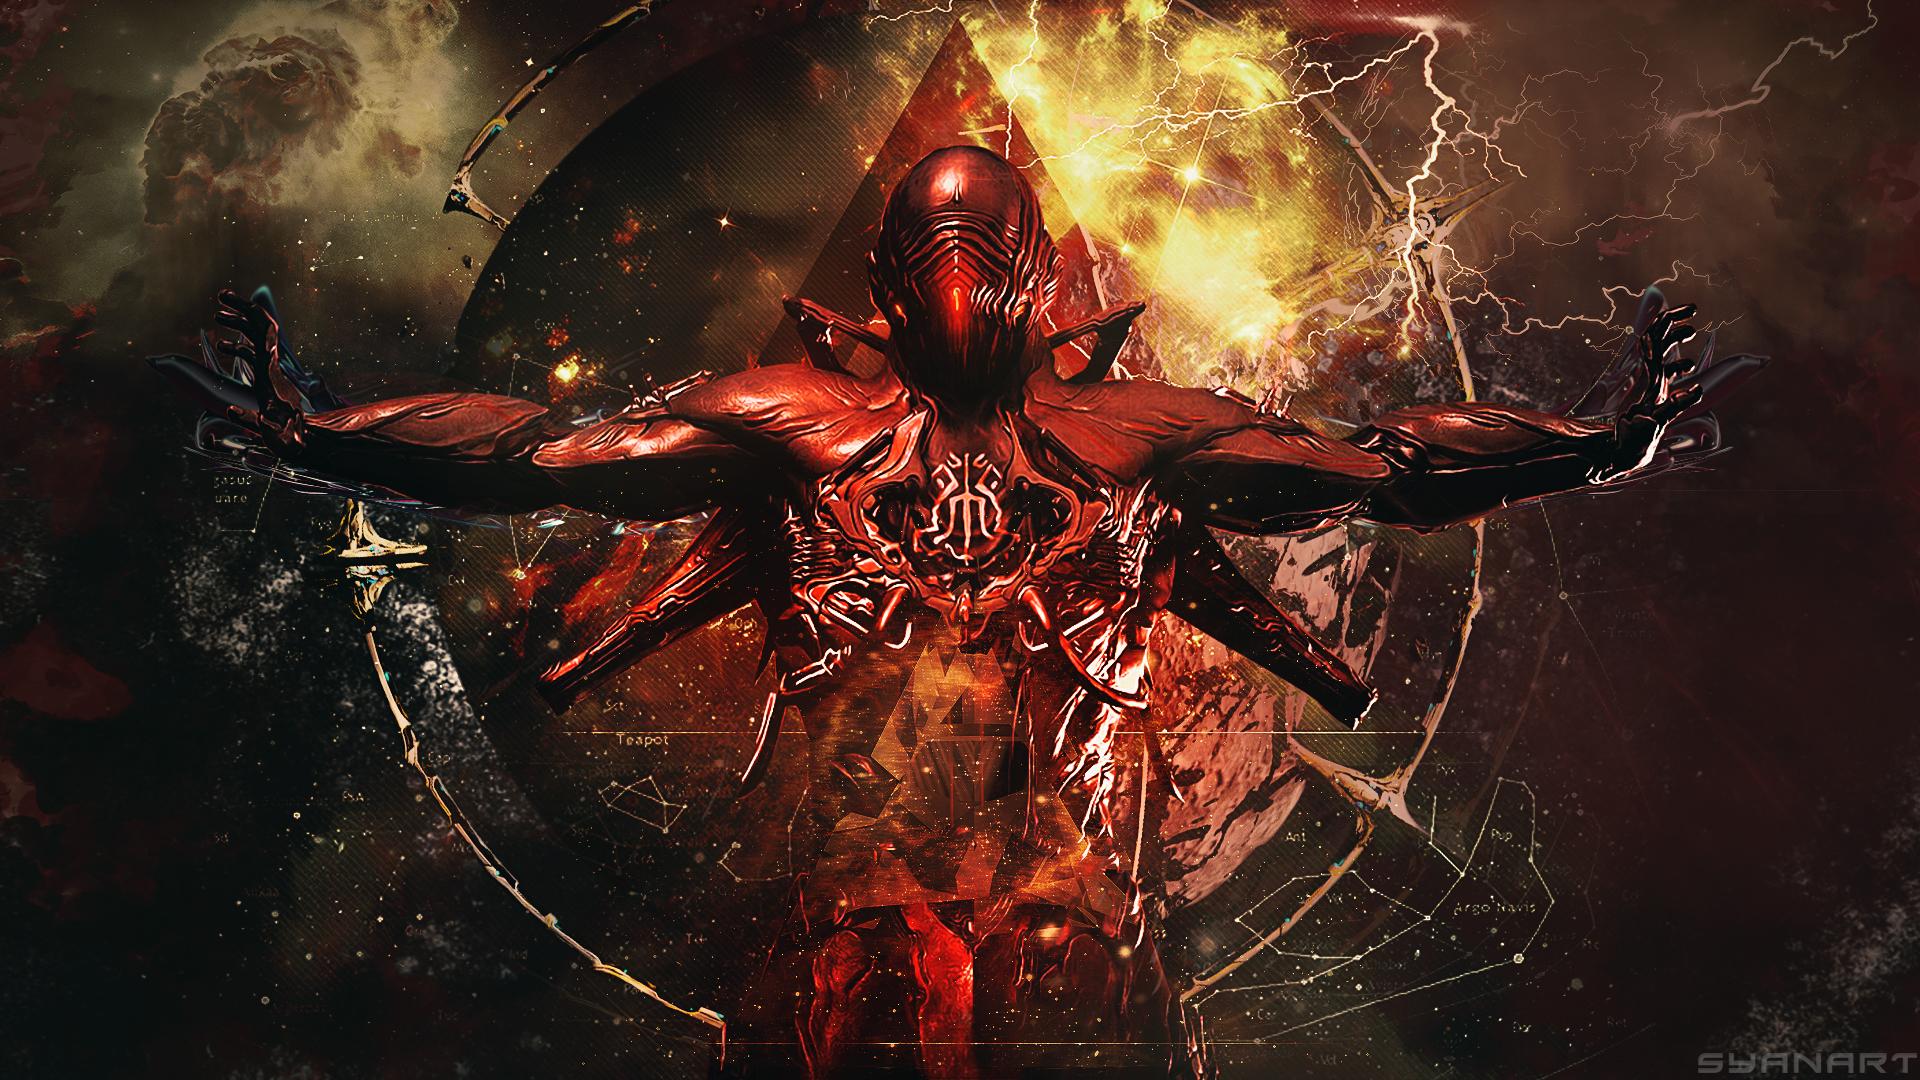 Mortal Kombat Scorpion wallpaper